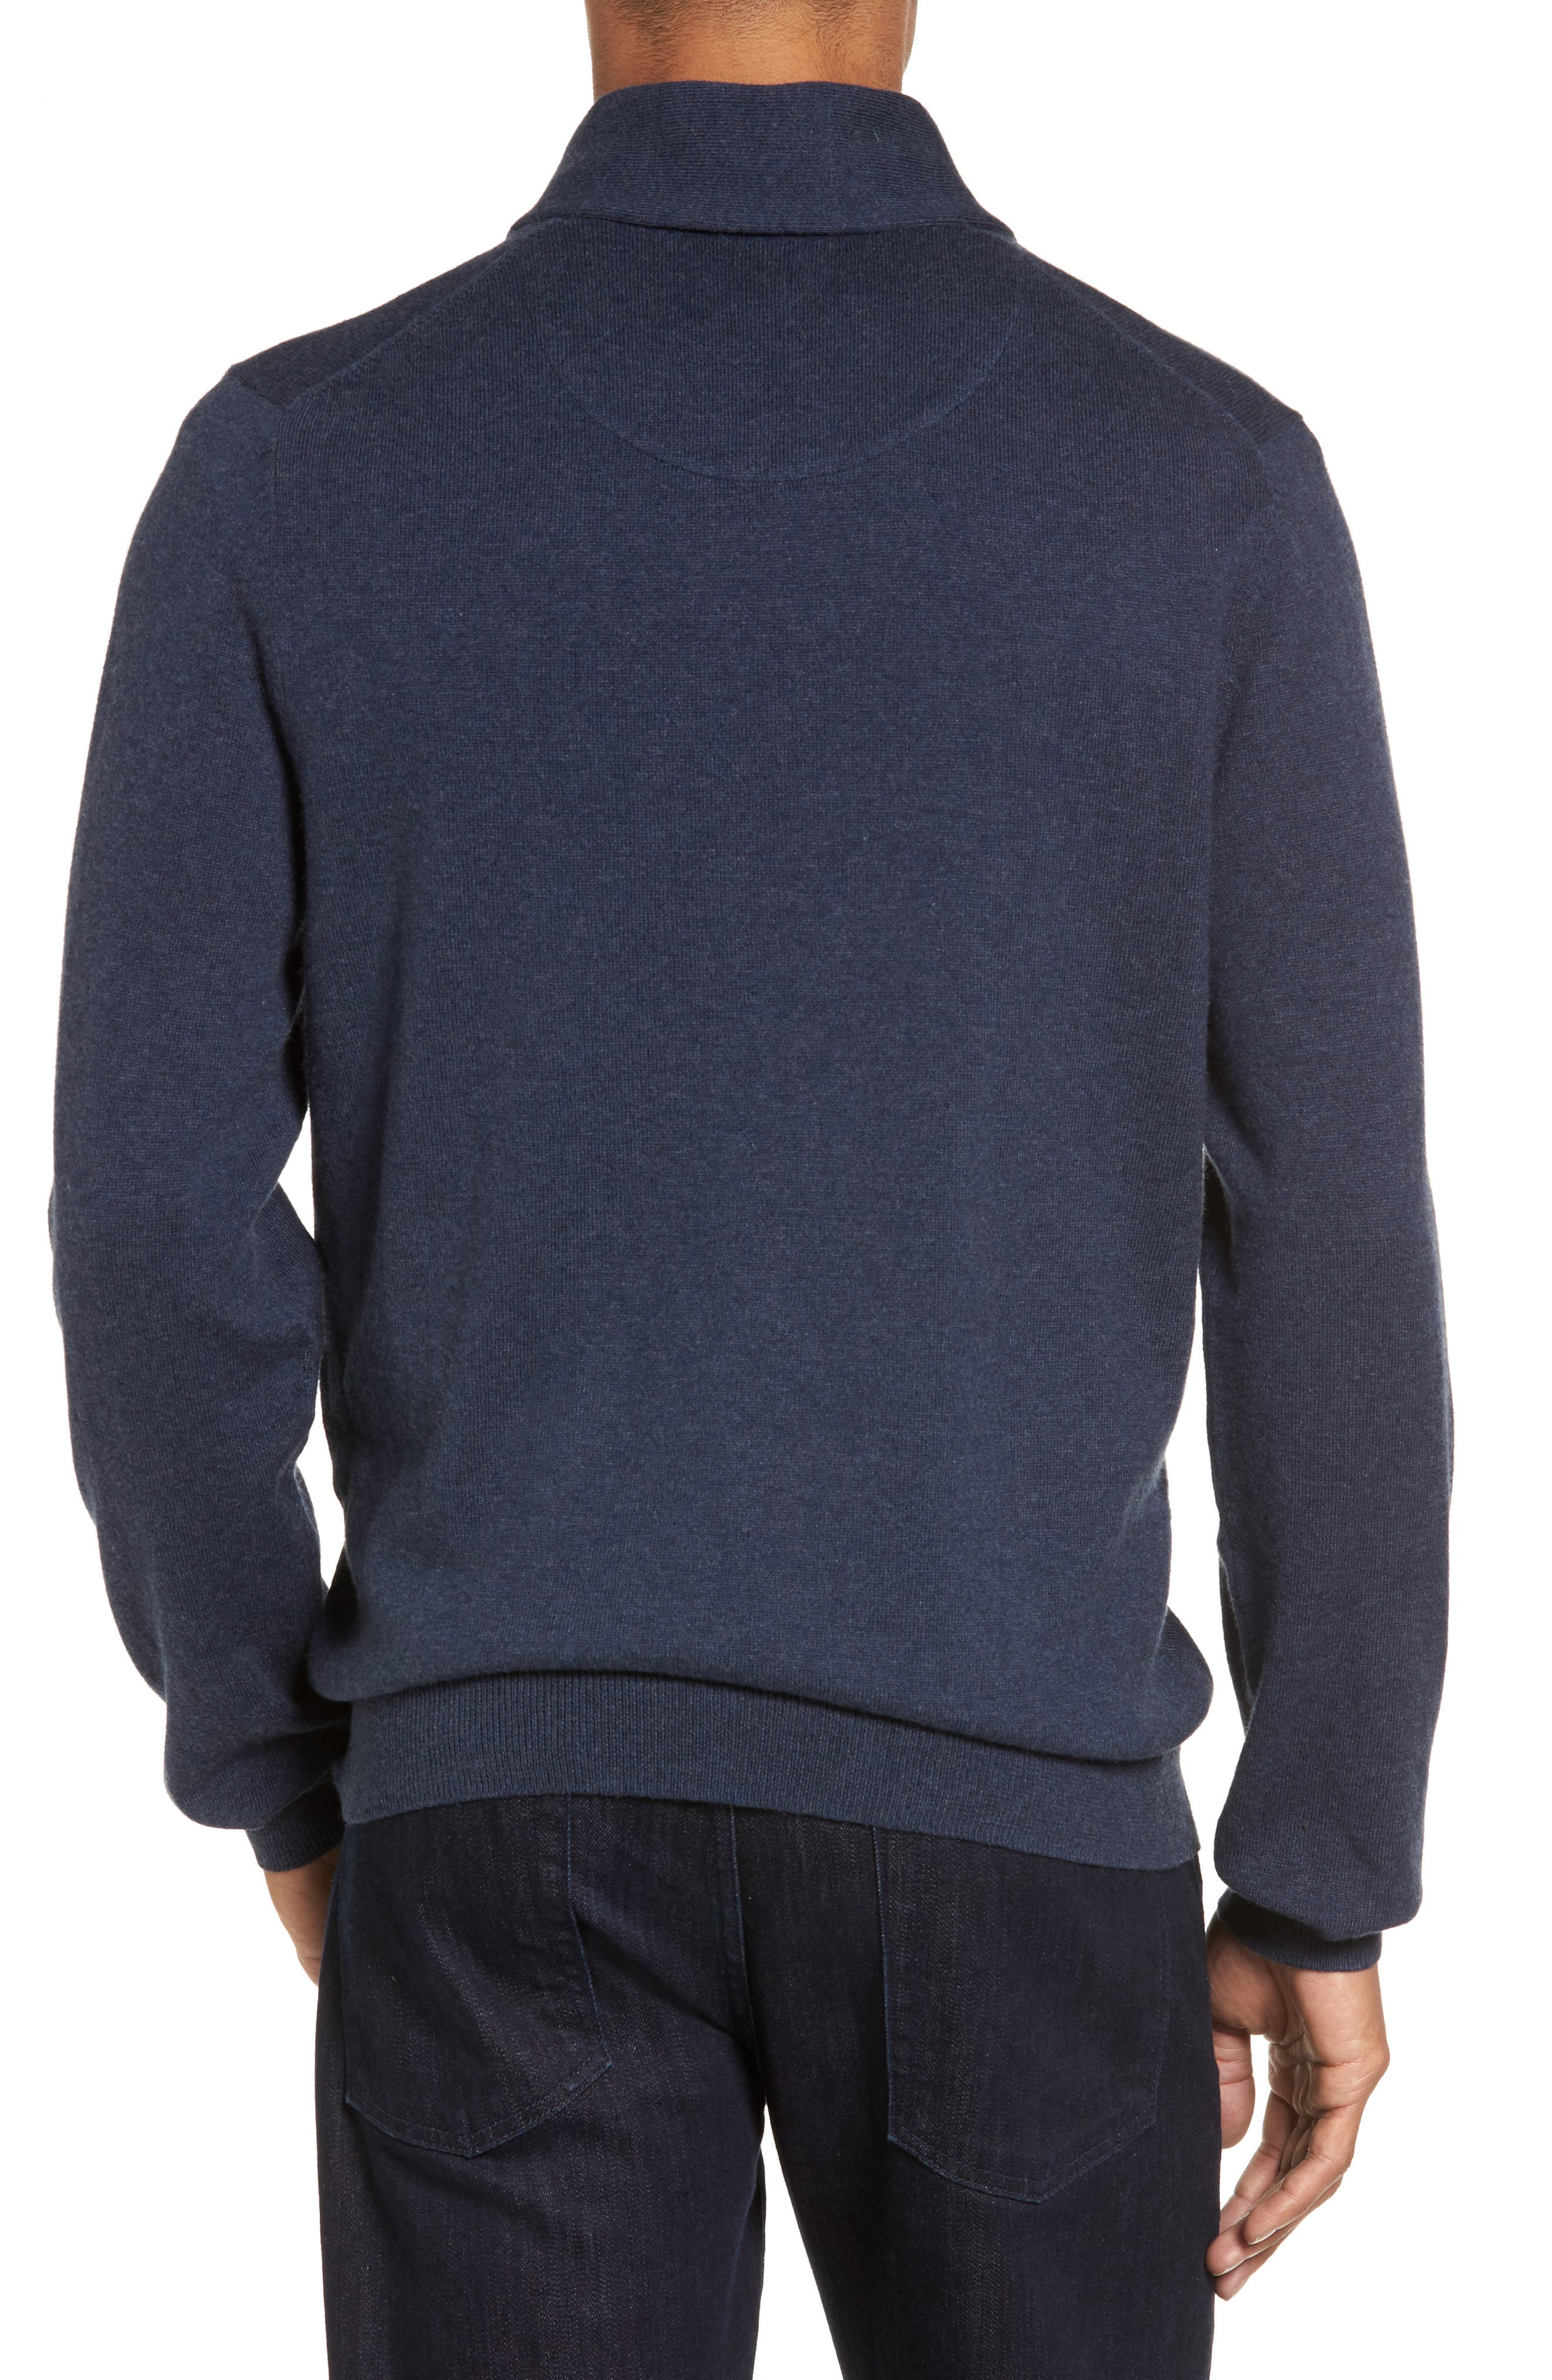 Alternate Image 2  - Nordstrom Men's Shop Cotton & Cashmere Shawl Collar Sweater (Regular & Tall)